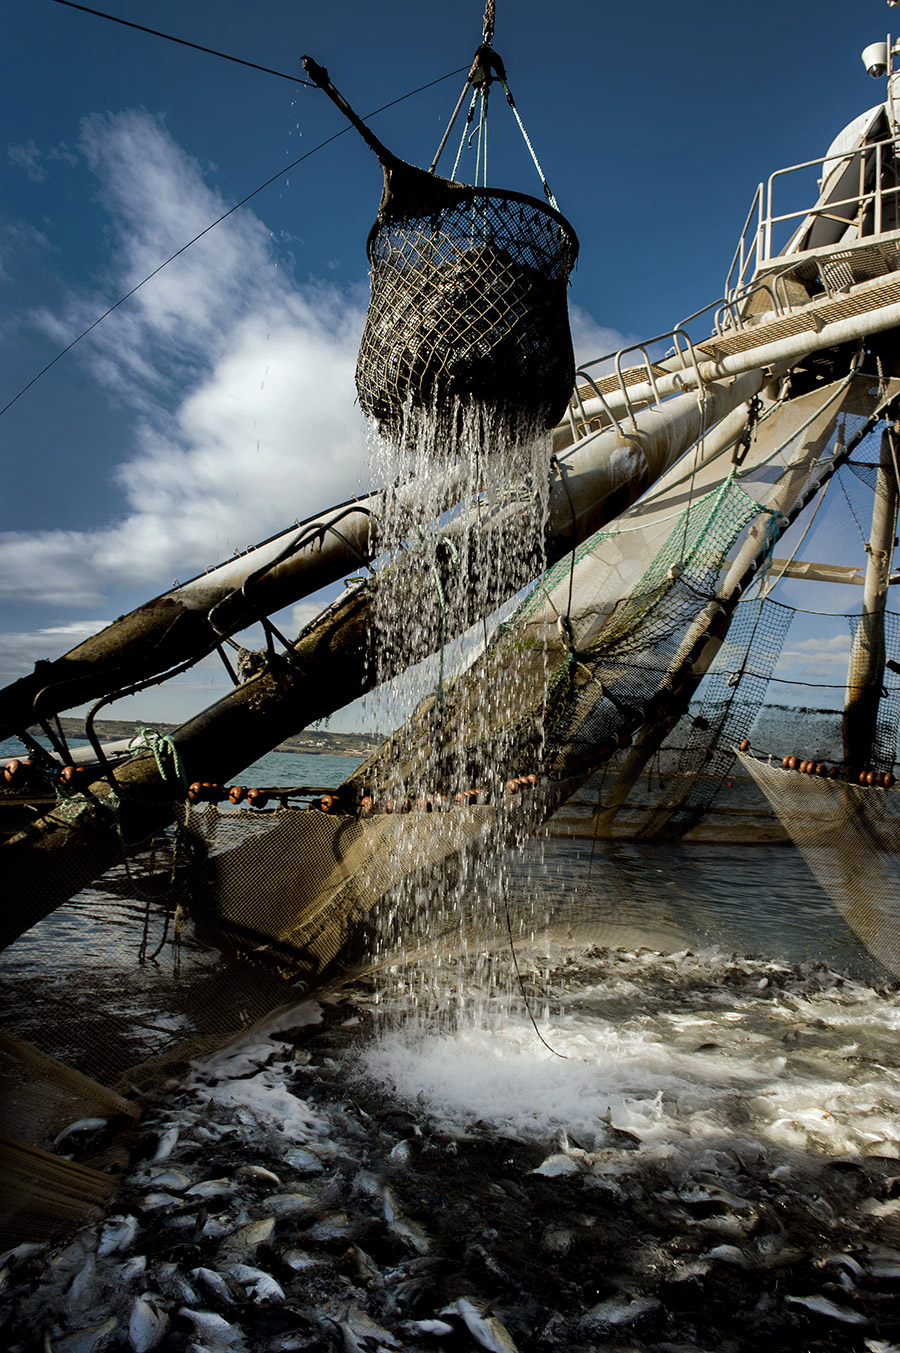 ivano-di-maria-coop-pesce-03